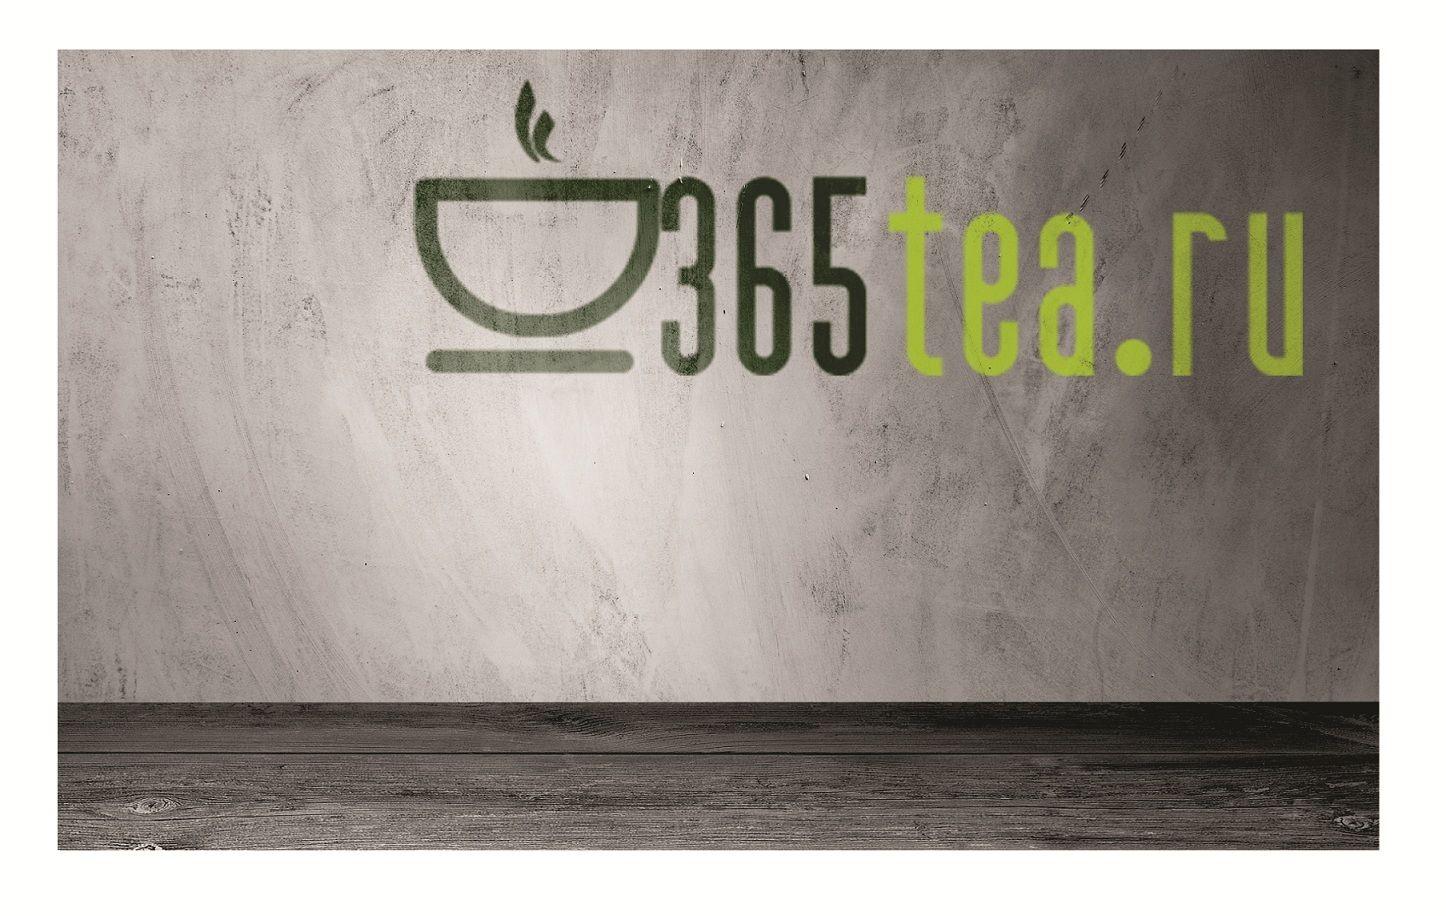 Логотип для 365tea.ru или 365TEA.RU - дизайнер JuliaRin